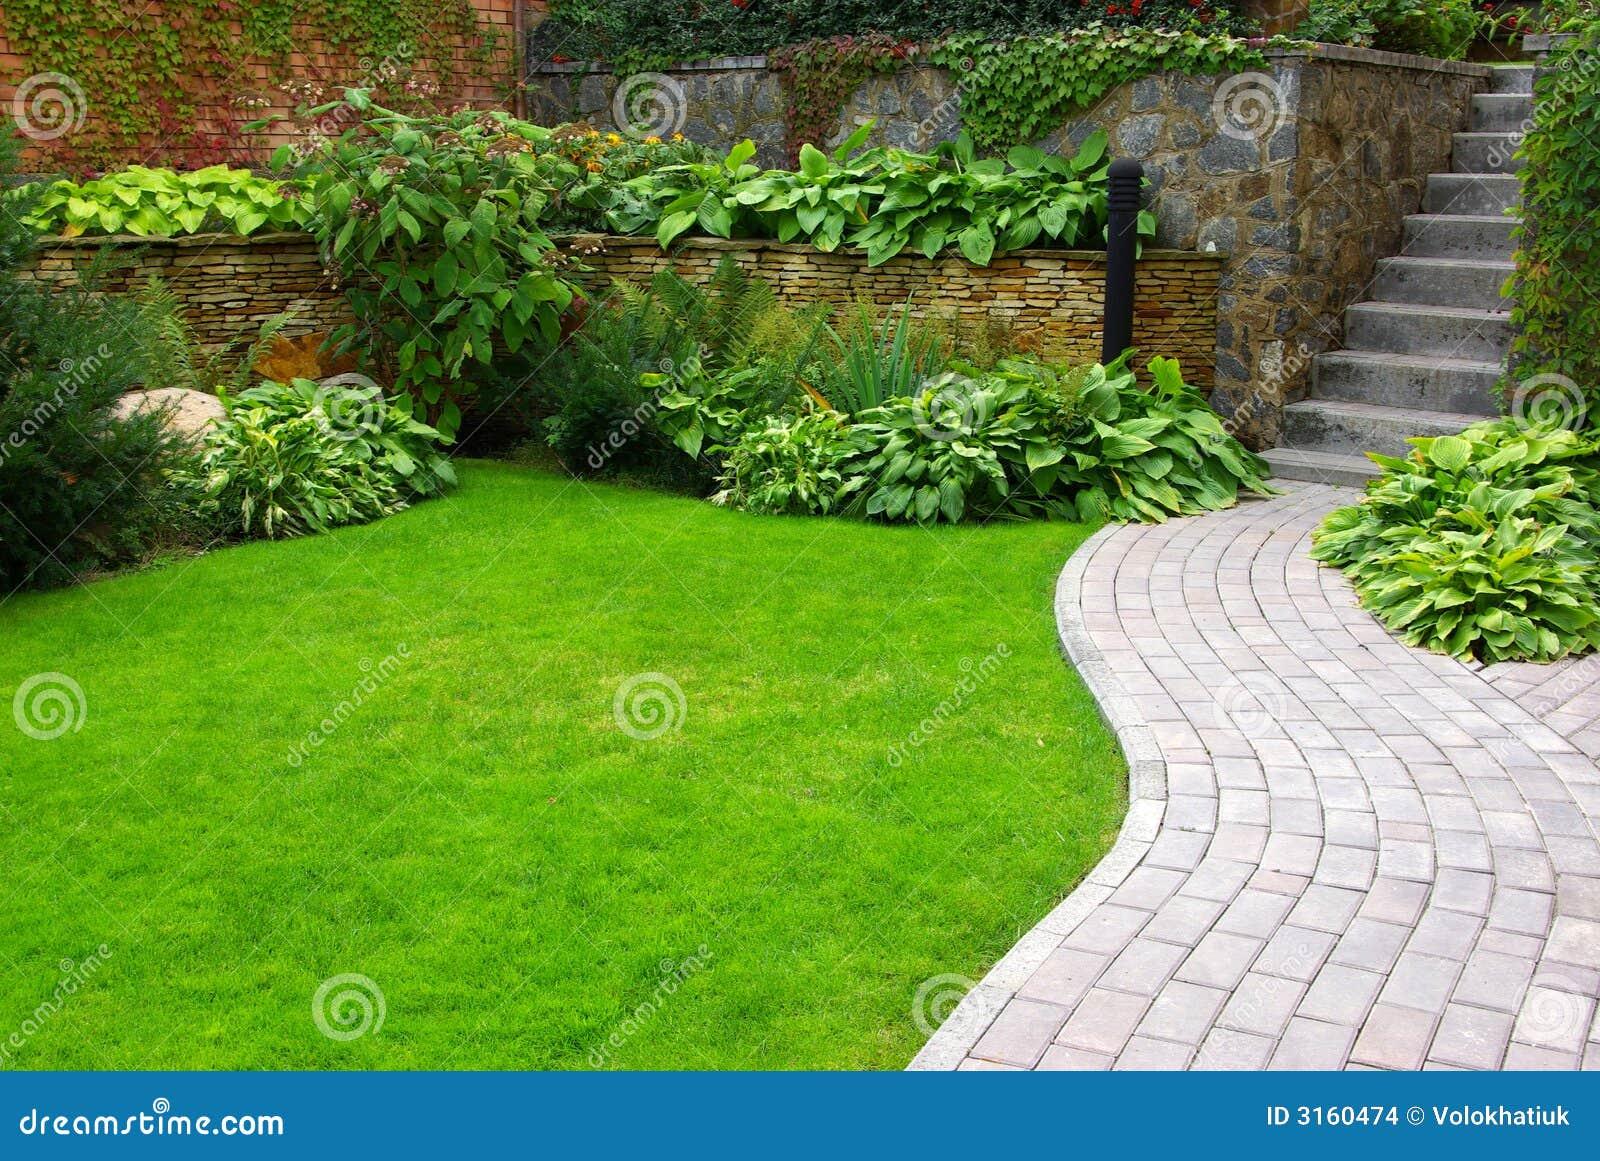 Download Garden stock photo. Image of direction, farmland, cobbles - 3160474